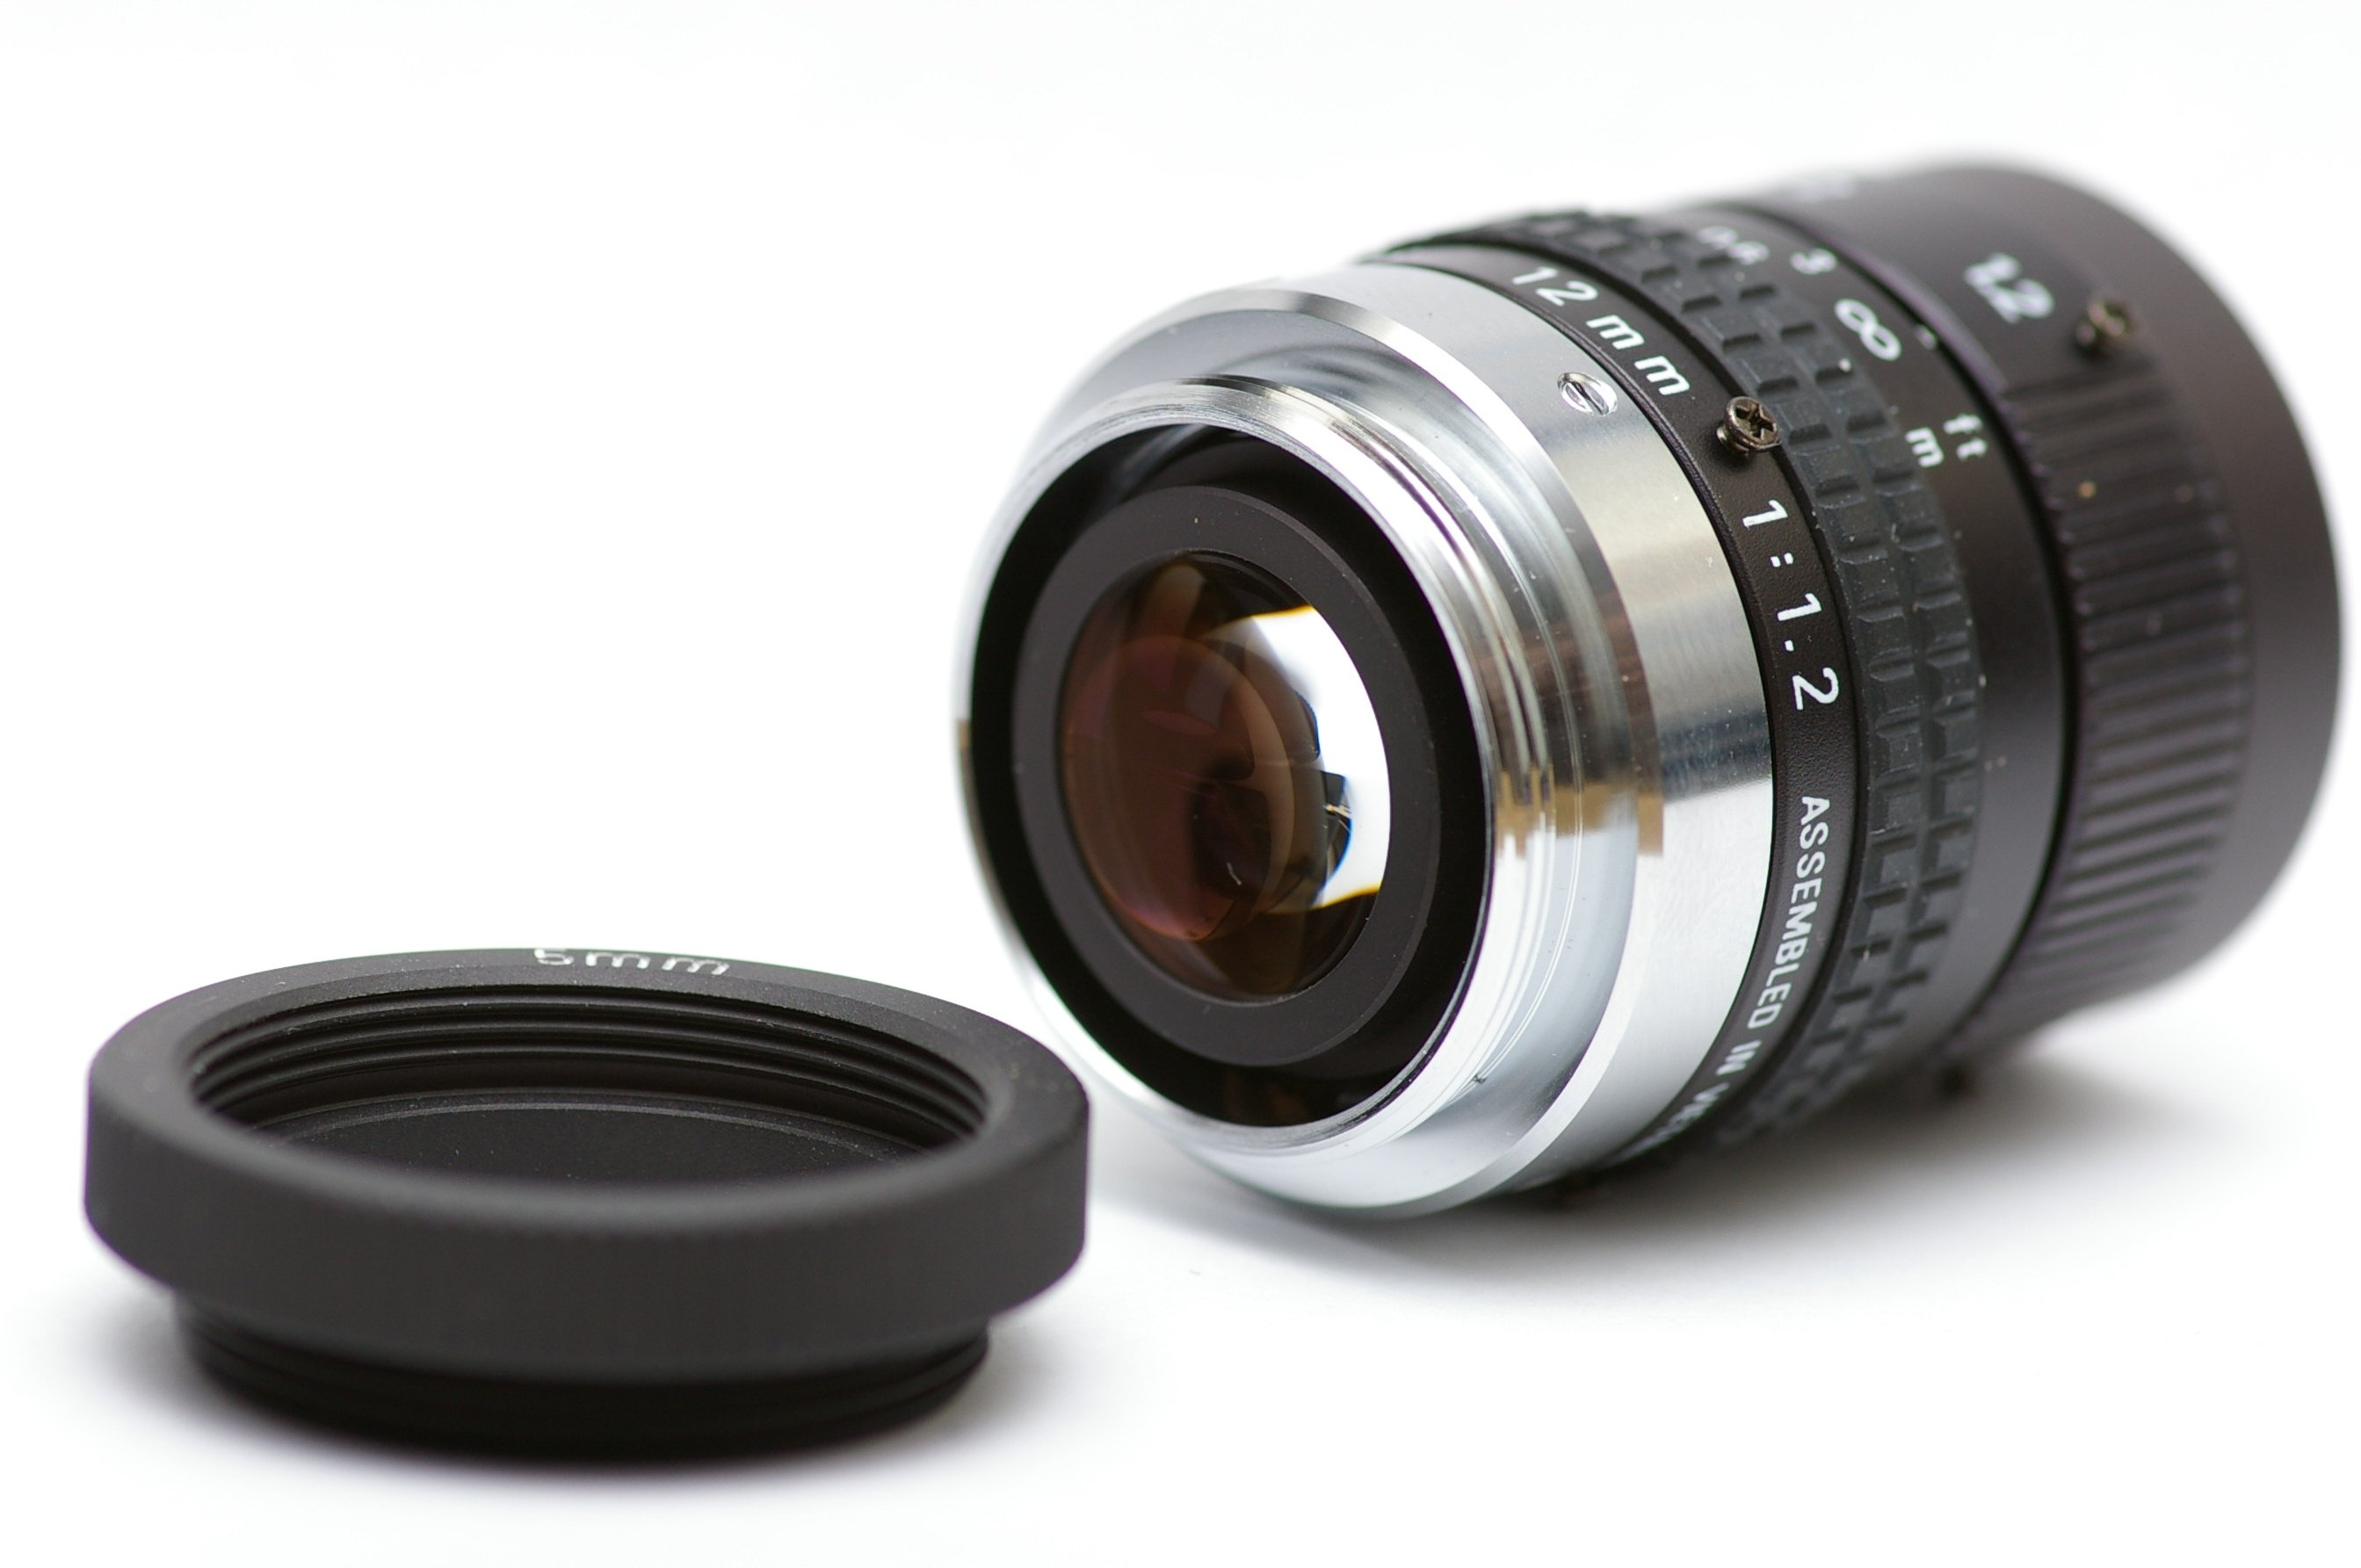 raspberry_pi_C_mount_lens_Pentax_12mm_f1.2.jpg